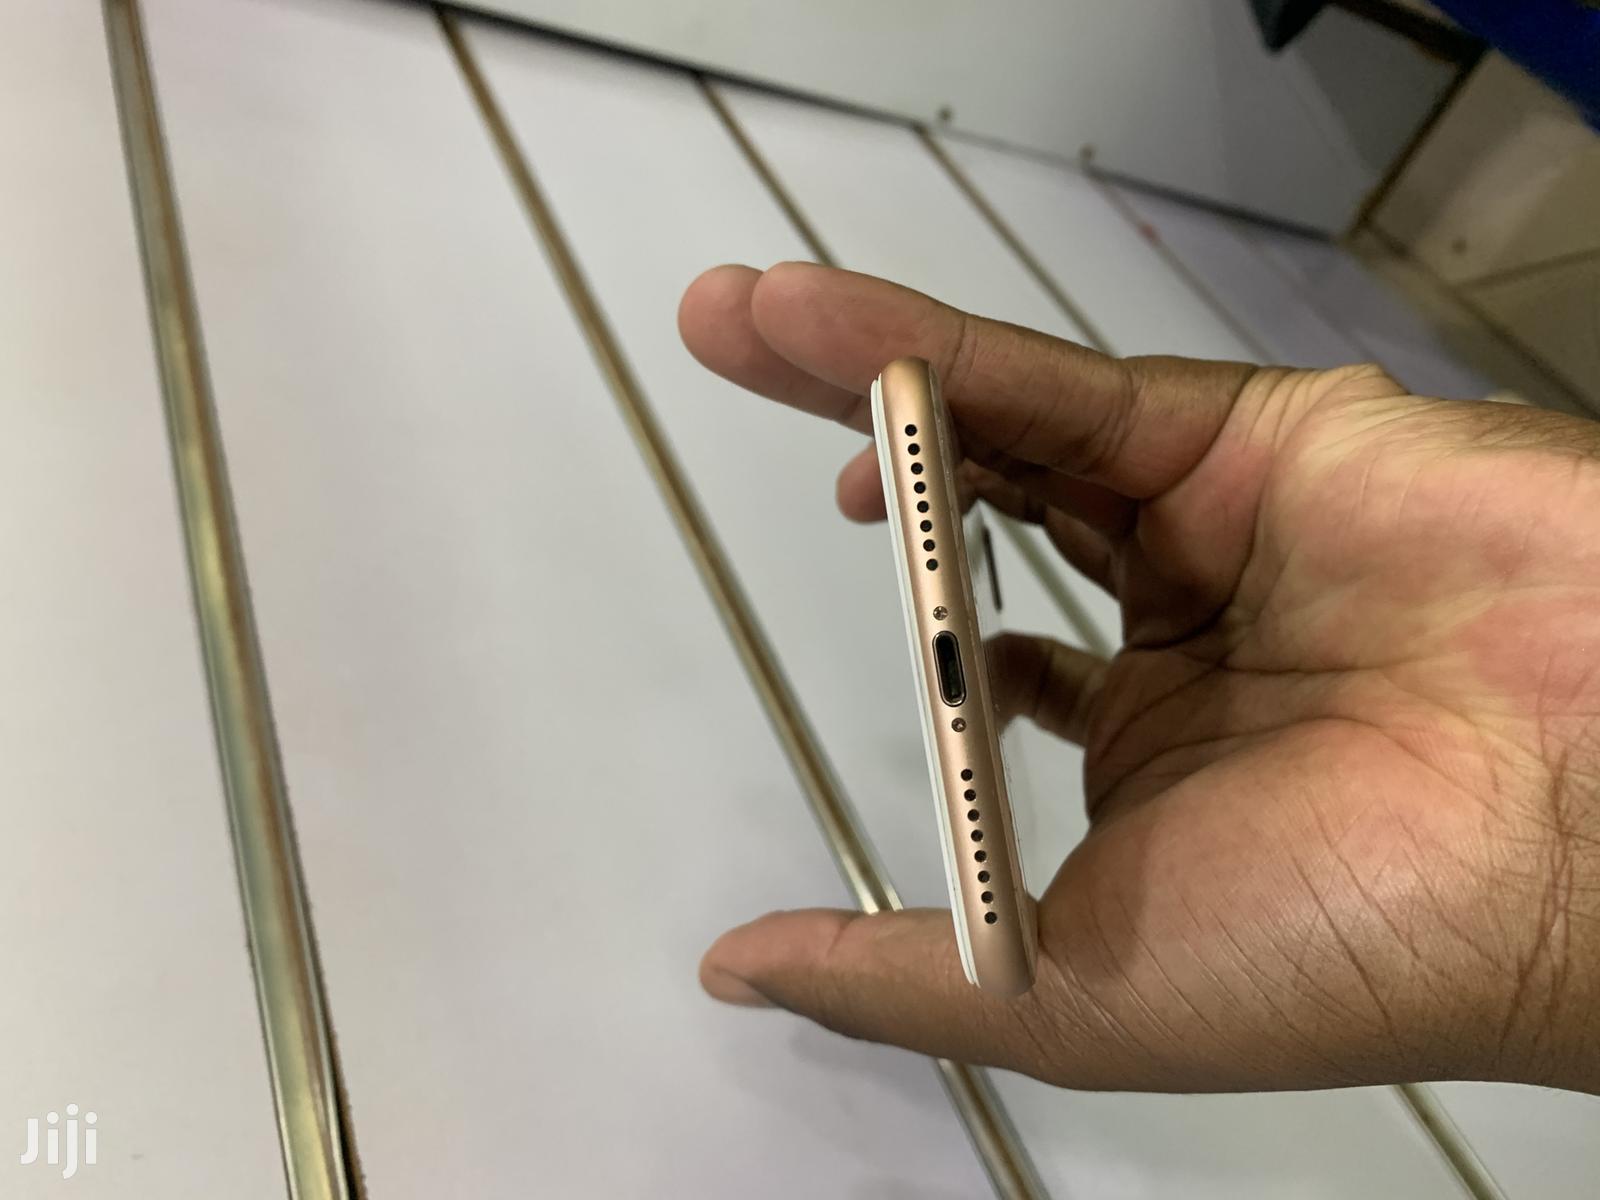 Apple iPhone 8 Plus 64 GB Gold | Mobile Phones for sale in Kampala, Central Region, Uganda